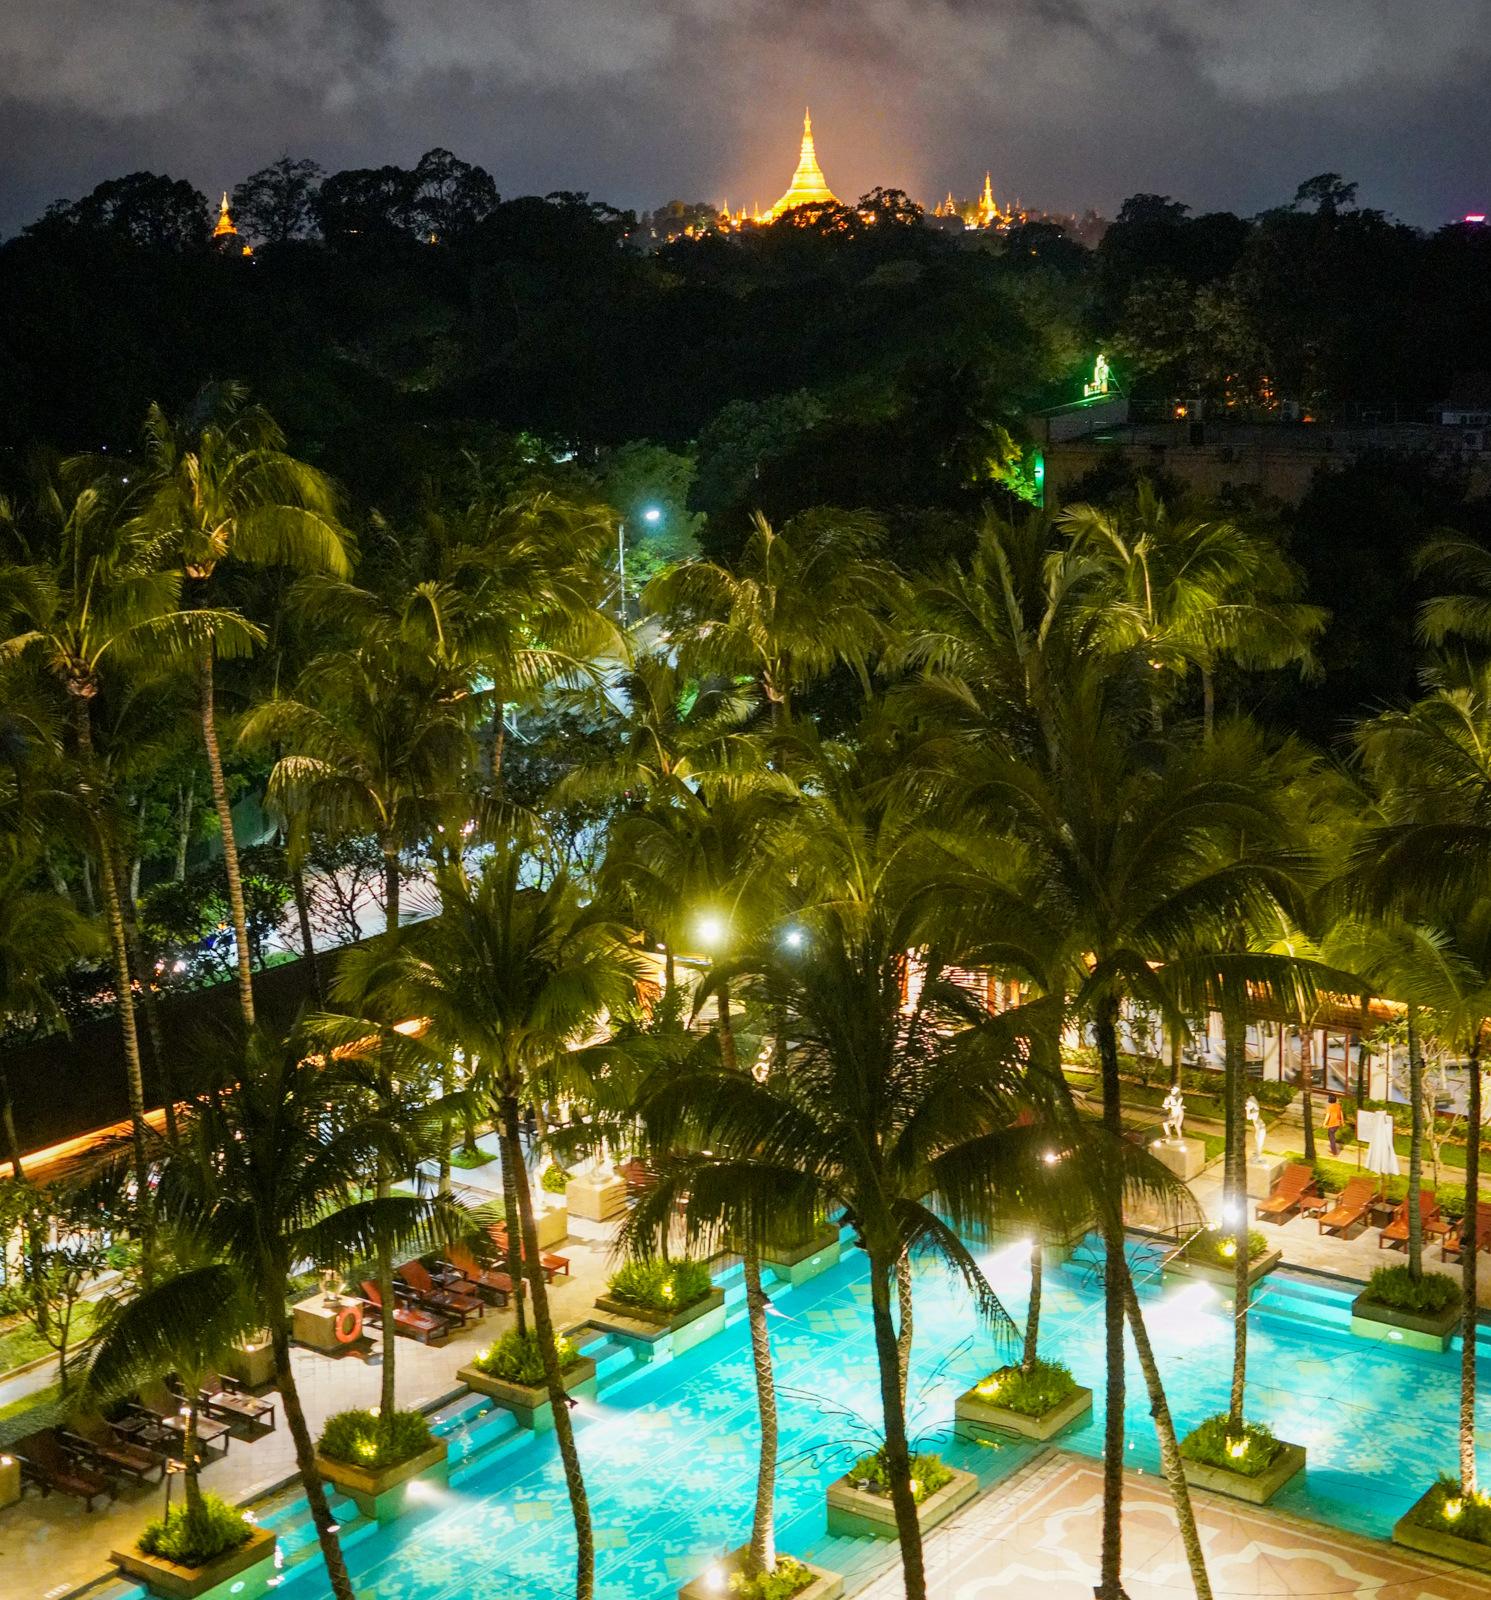 With a View, Chatrium Hotel Royal Lake Yangon